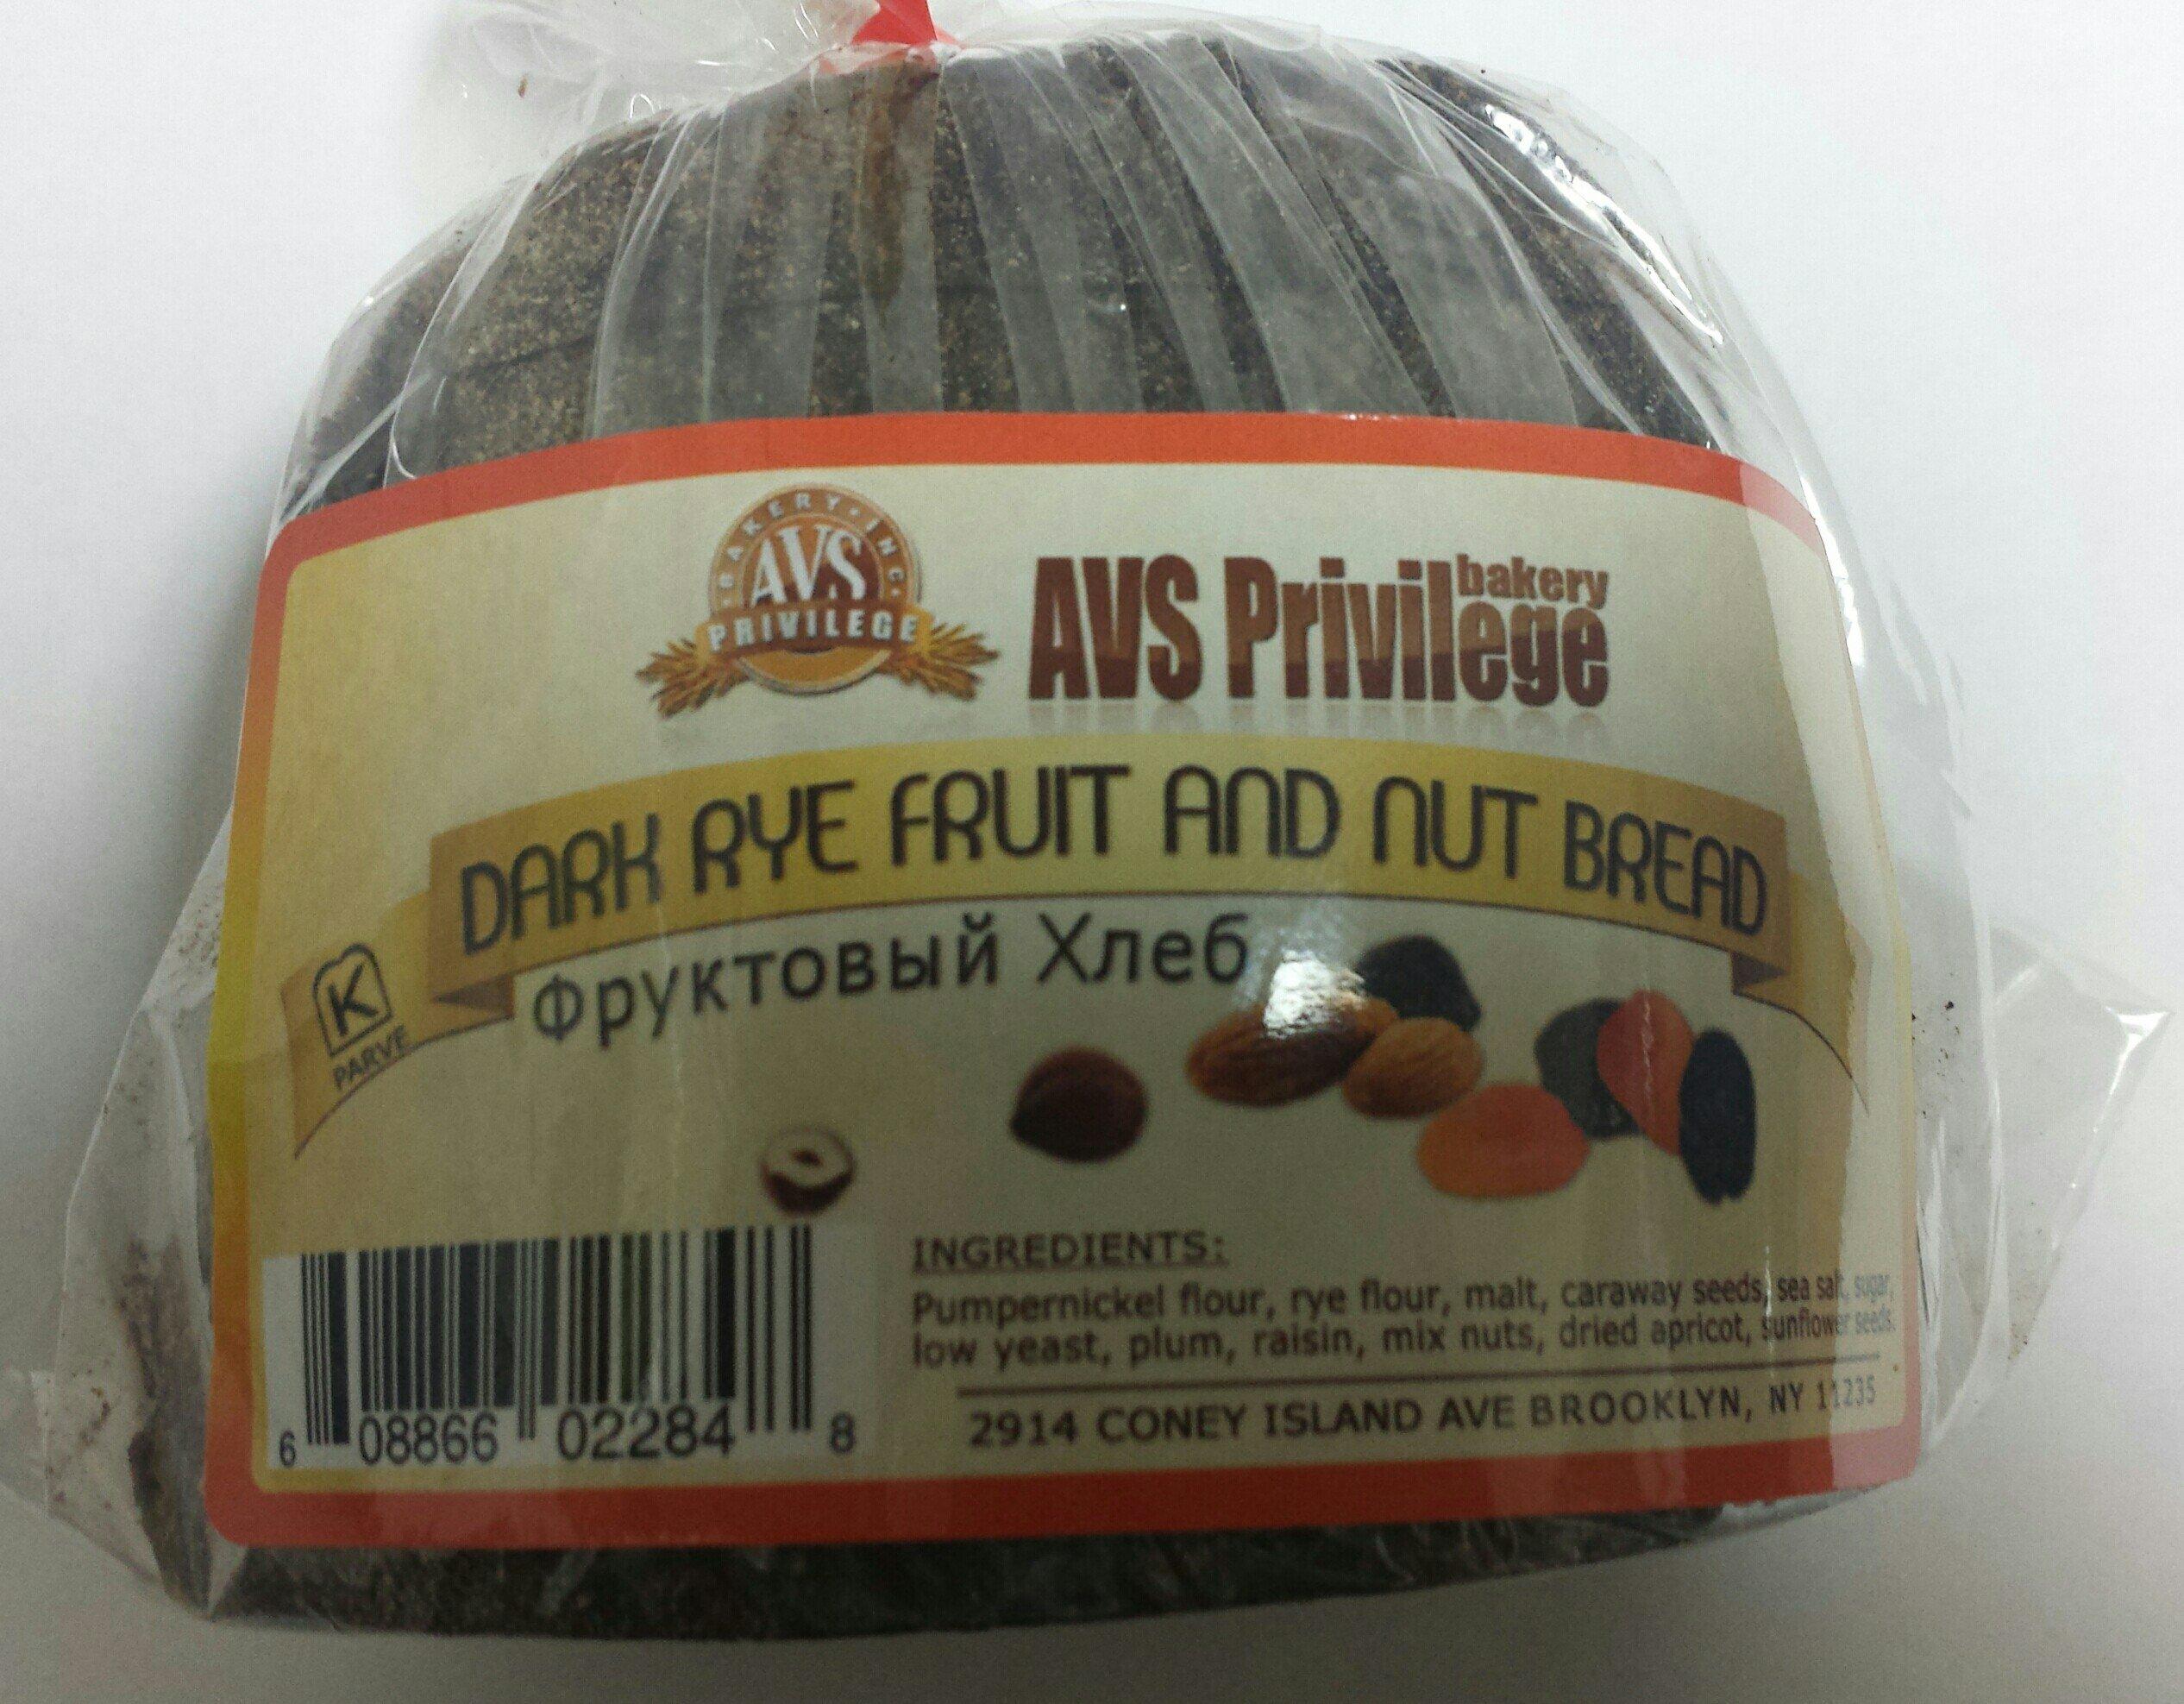 European Fruit & Nut Dark Rye Bread Pack of 4 by Gourmet Market Bakery